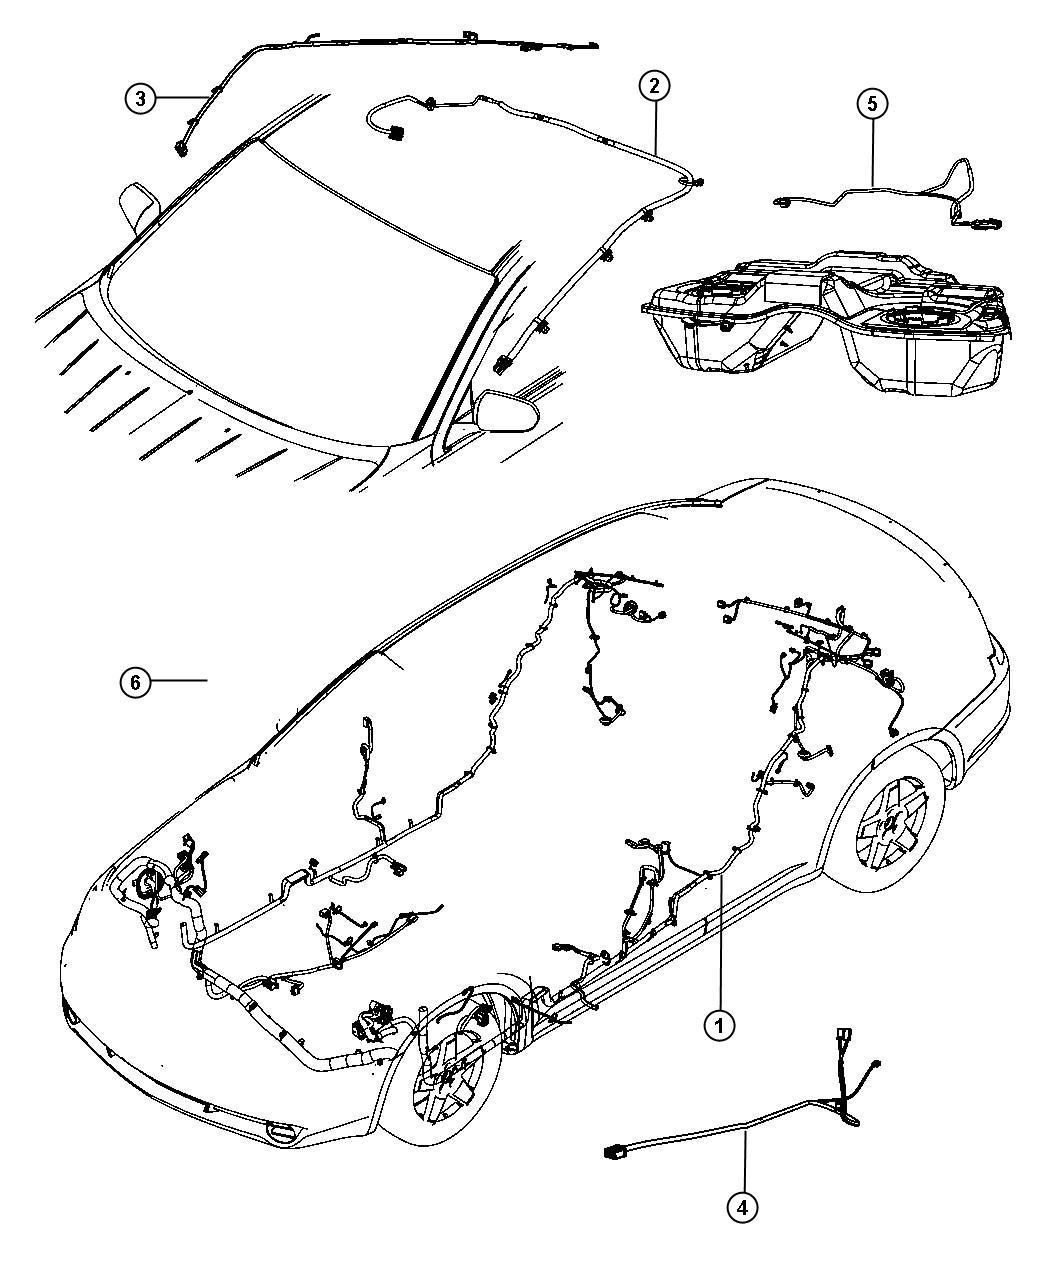 Chrysler 200 Wiring. Unified body. [sirius satellite radio